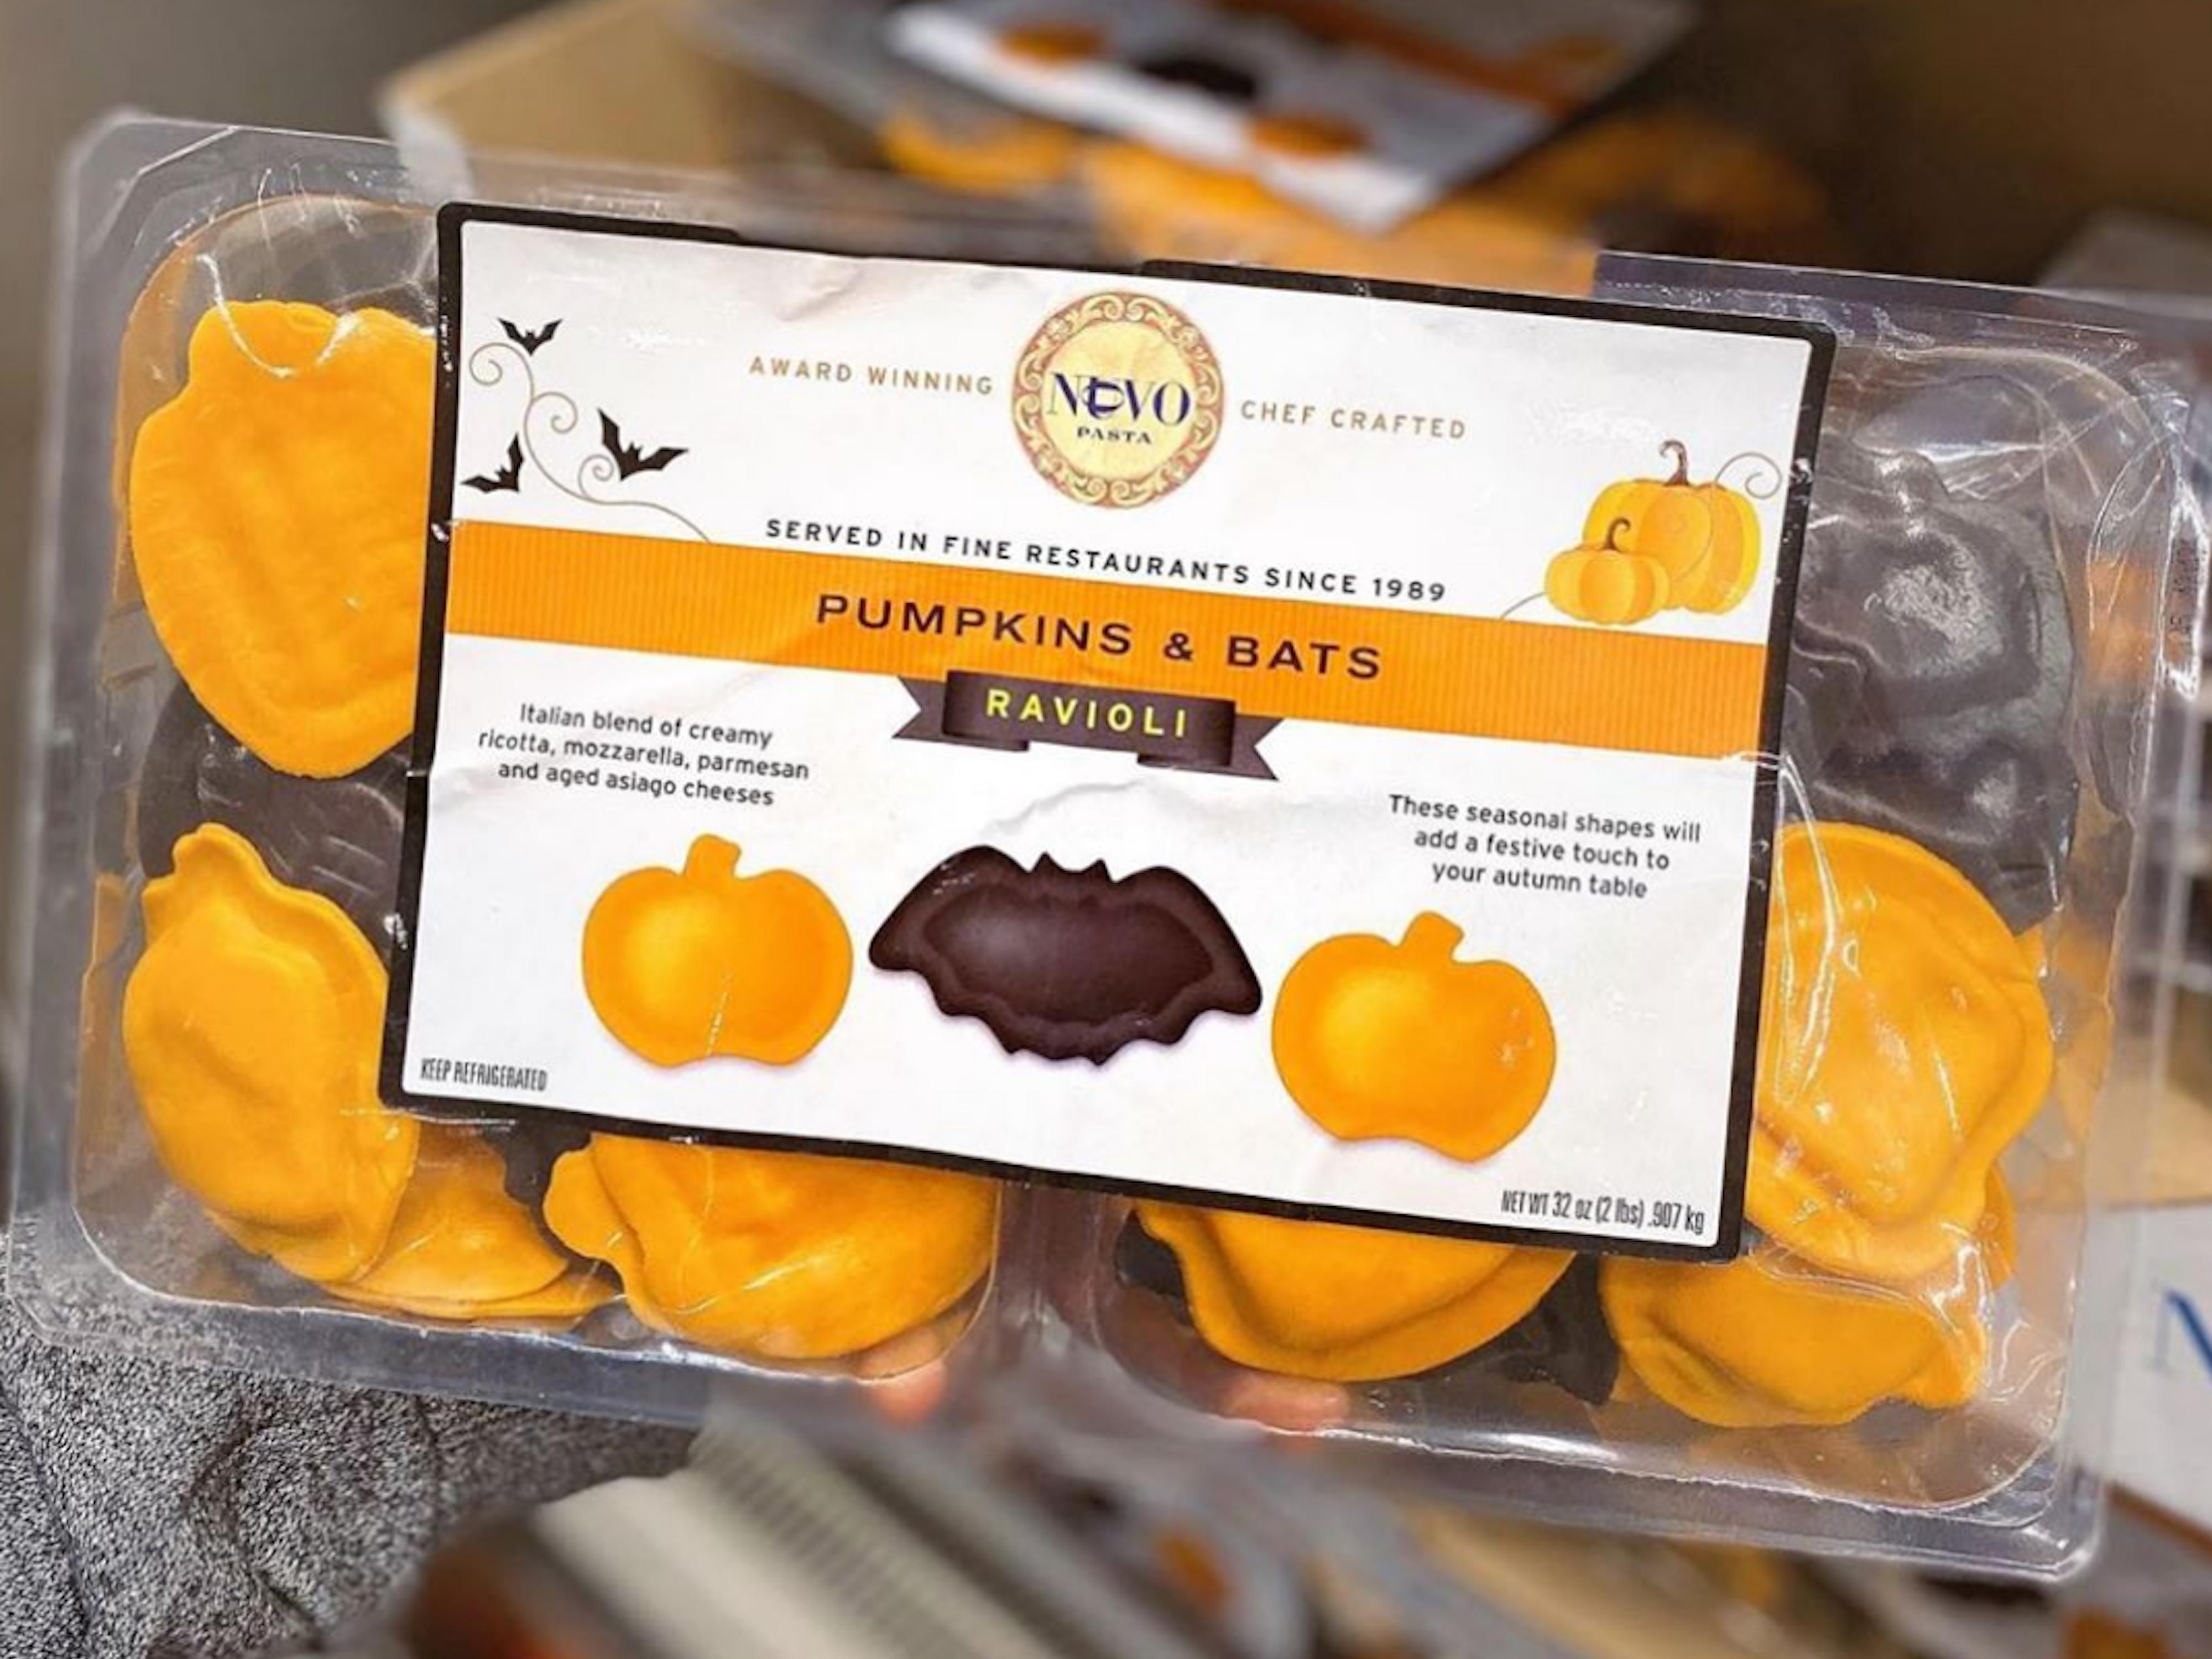 costco-pumpkin-bat-ravioli